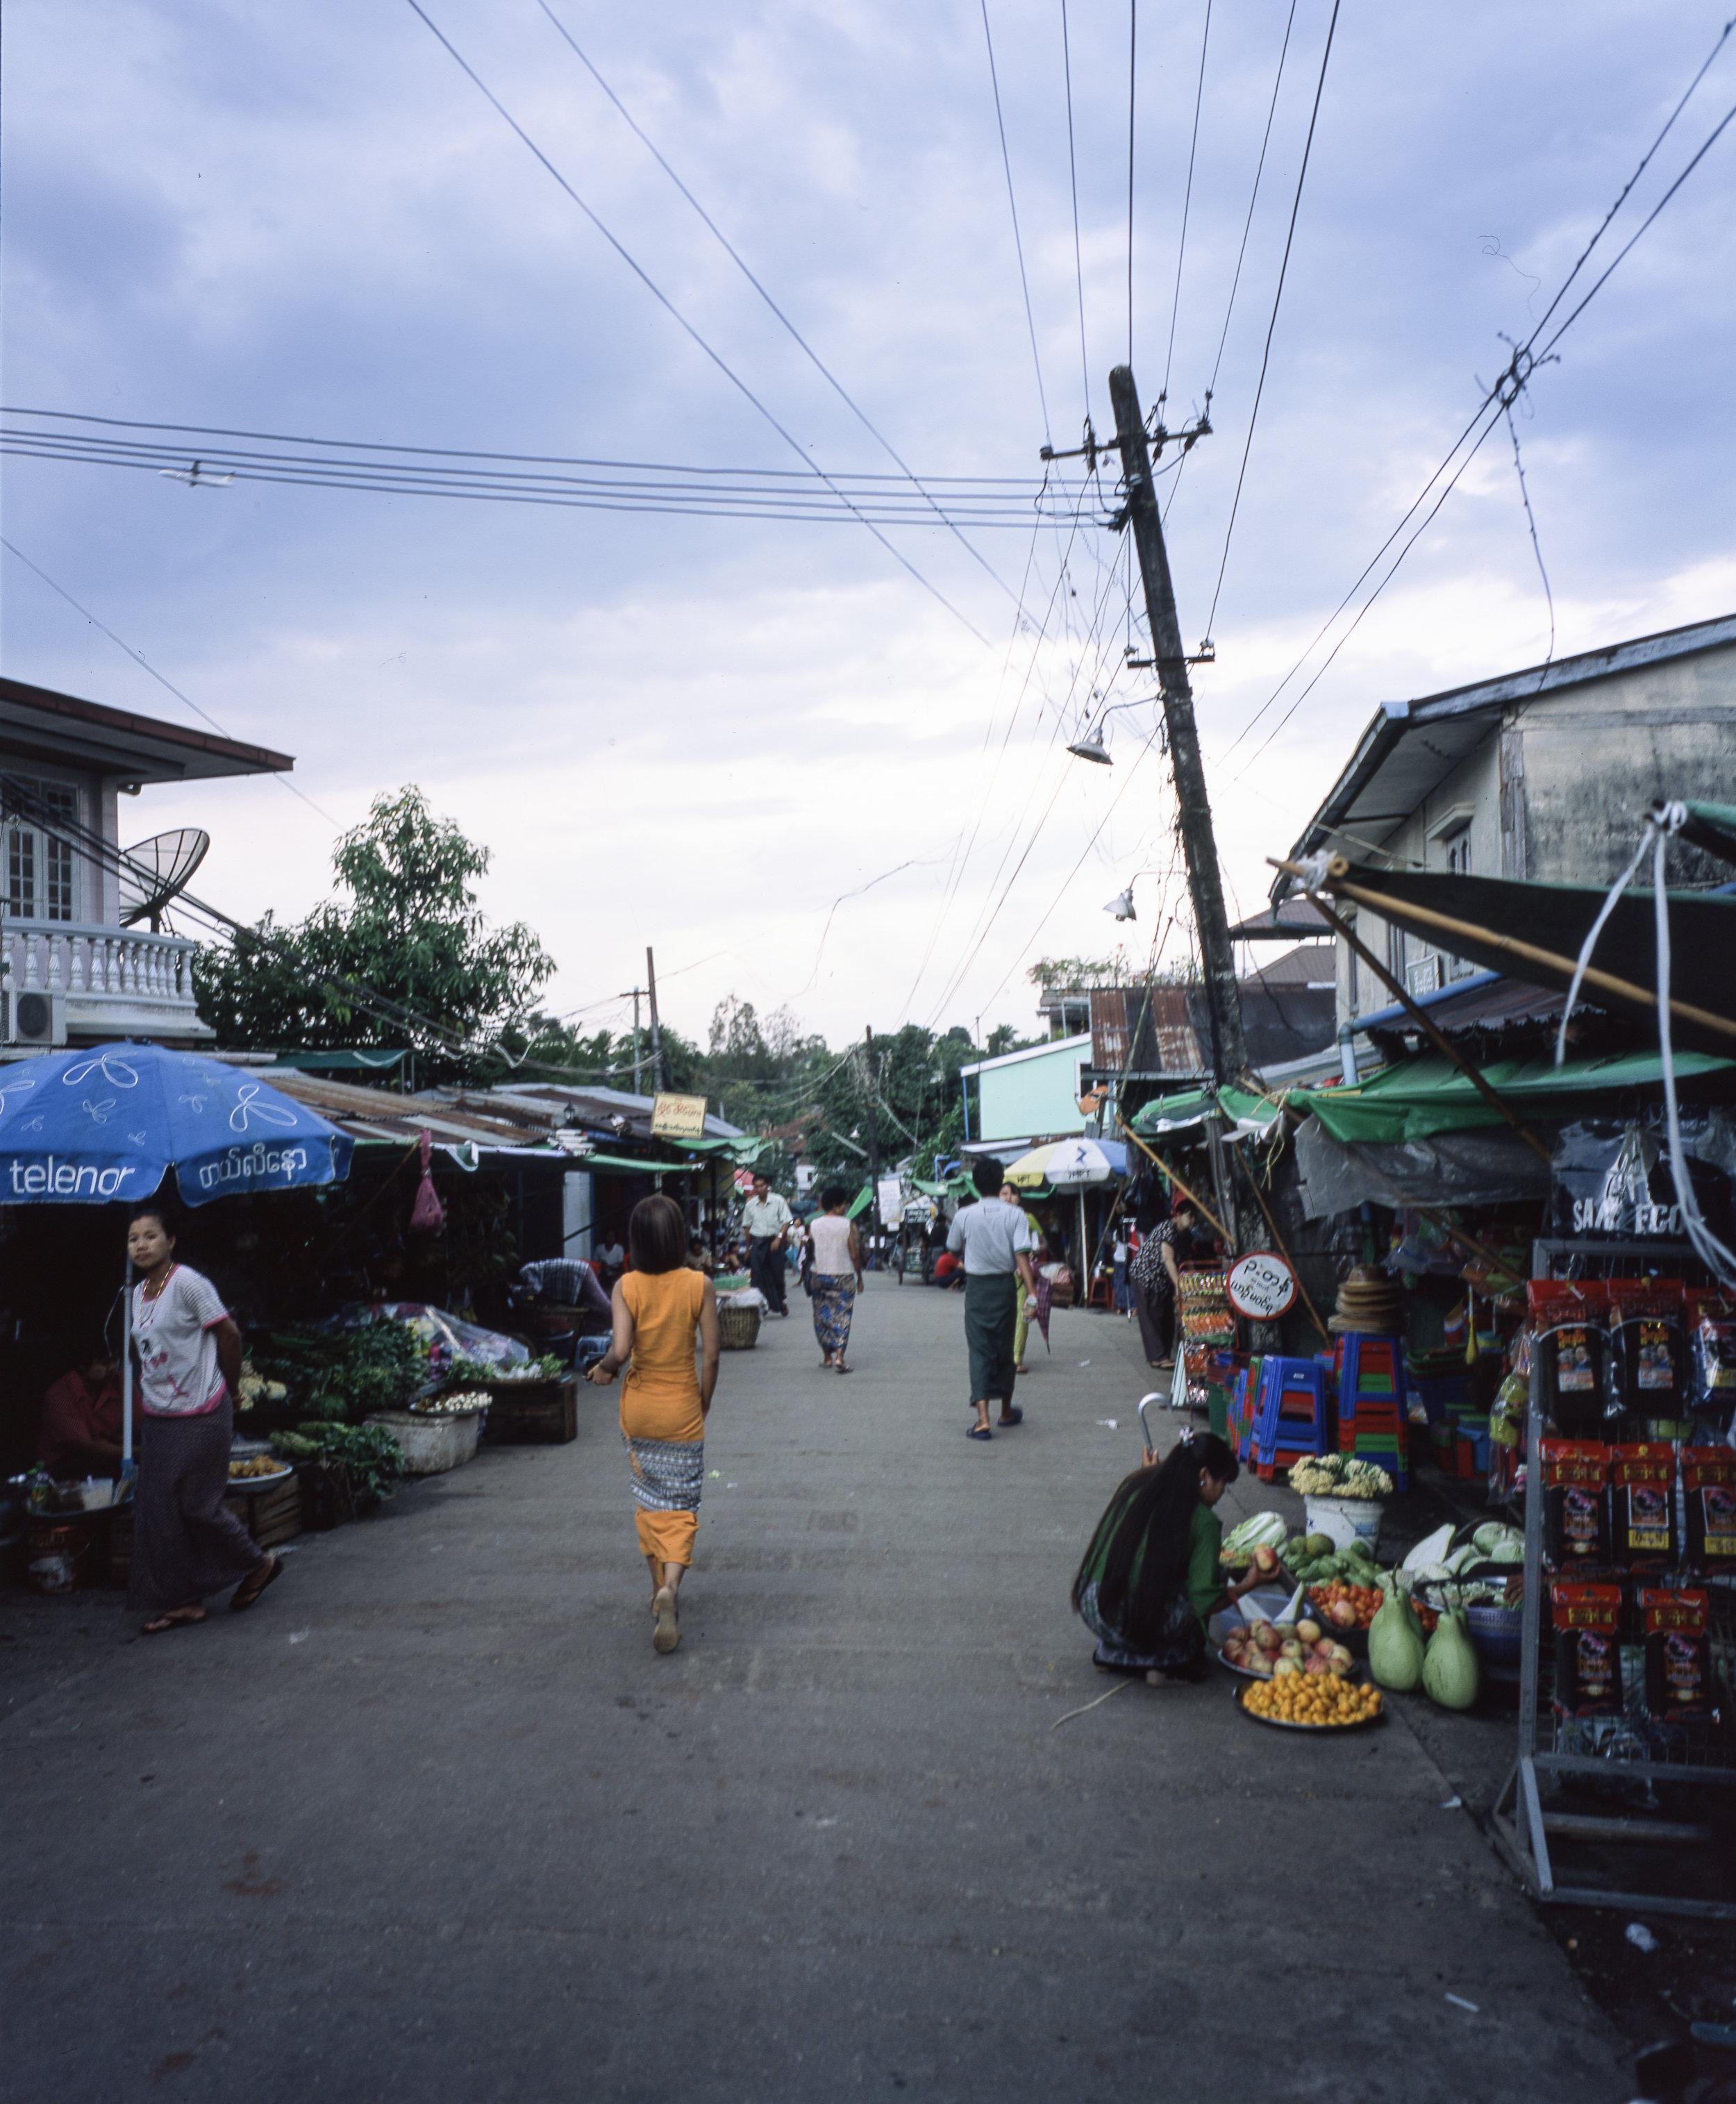 Yangon Market Fuji GF670w | Fuji Provia 100f